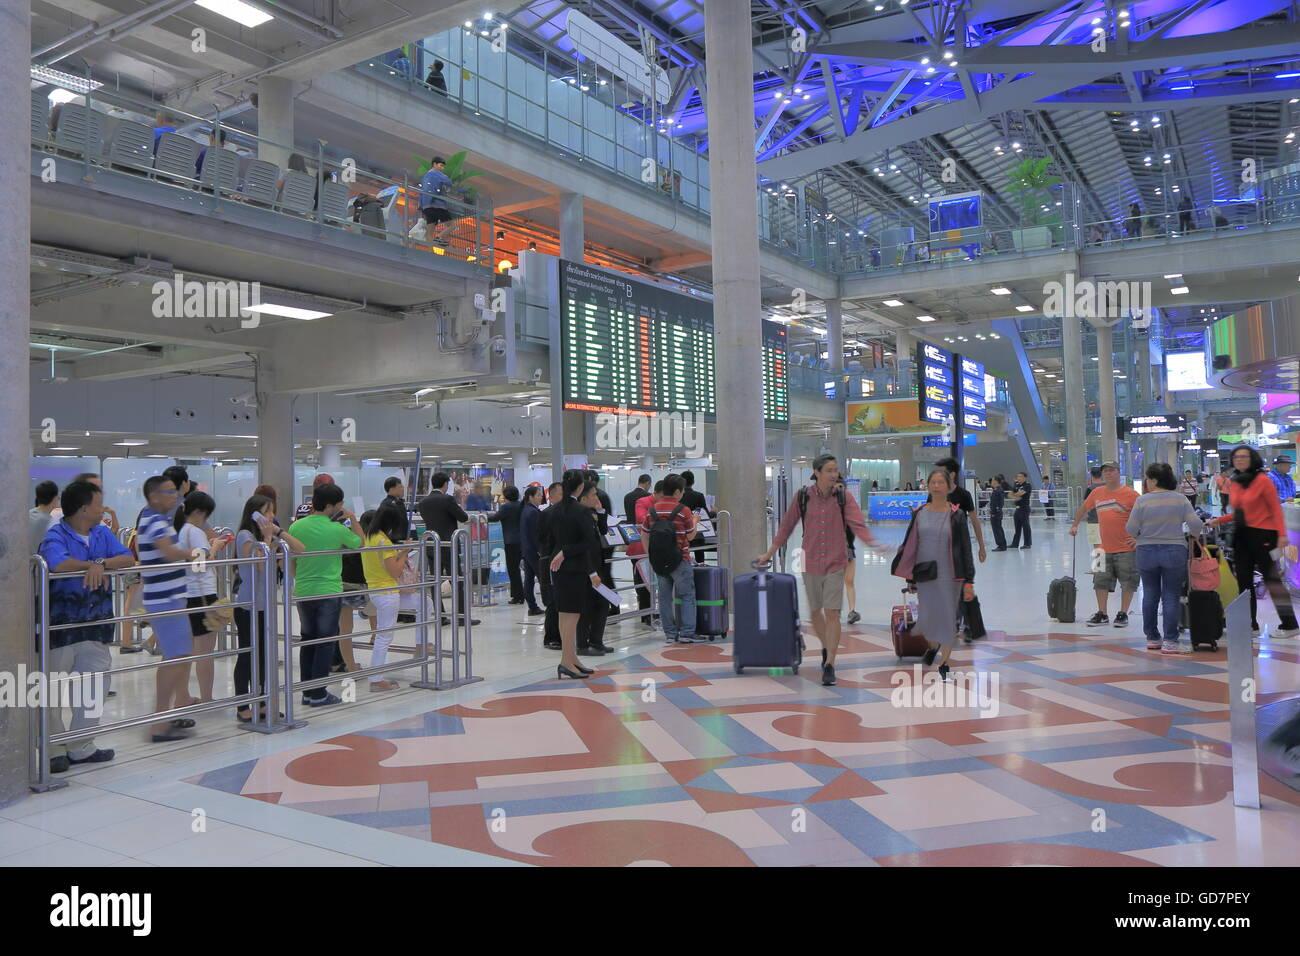 Les gens voyagent à l'aéroport de Suvarnabhumi à Bangkok en Thaïlande Photo Stock